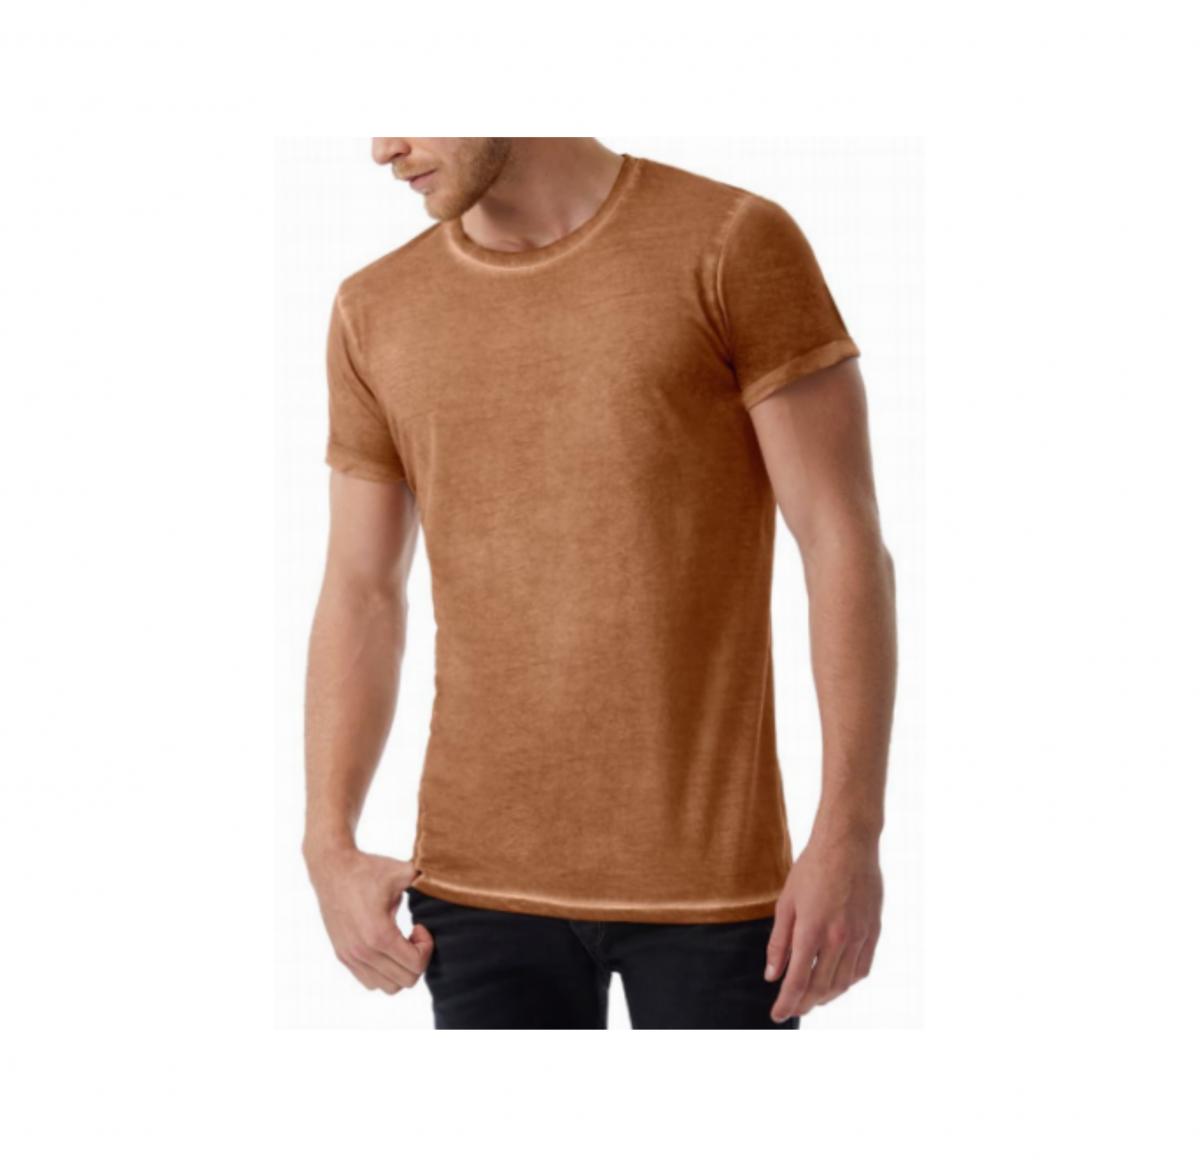 Tee-Shirt Homme Vintage - Gris